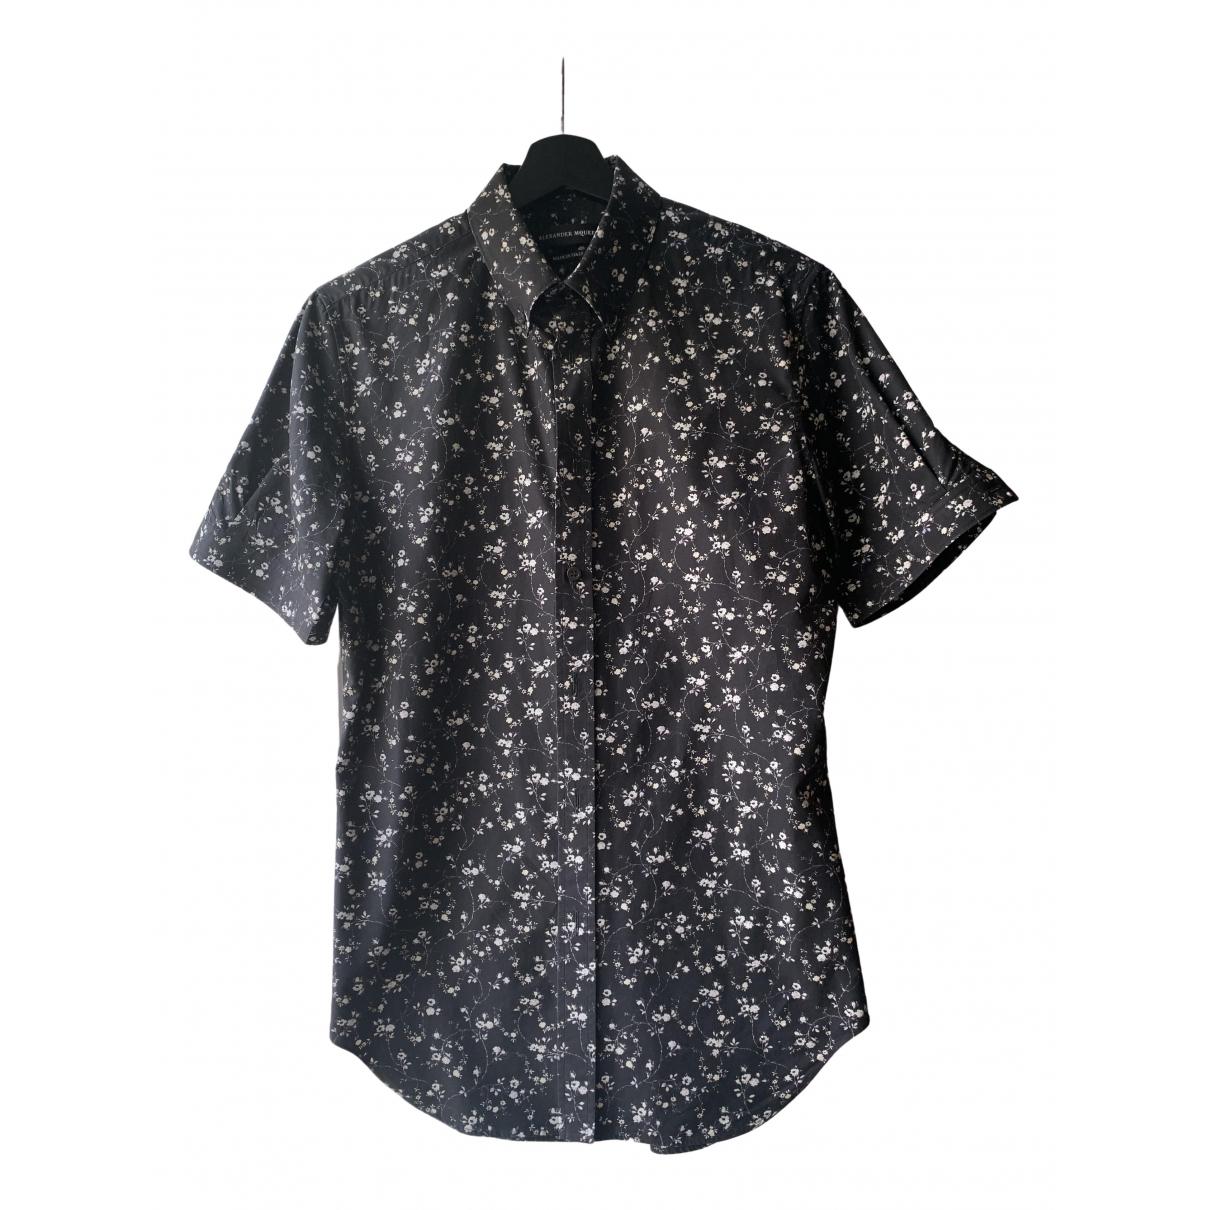 Alexander Mcqueen \N Black Cotton Shirts for Men M International